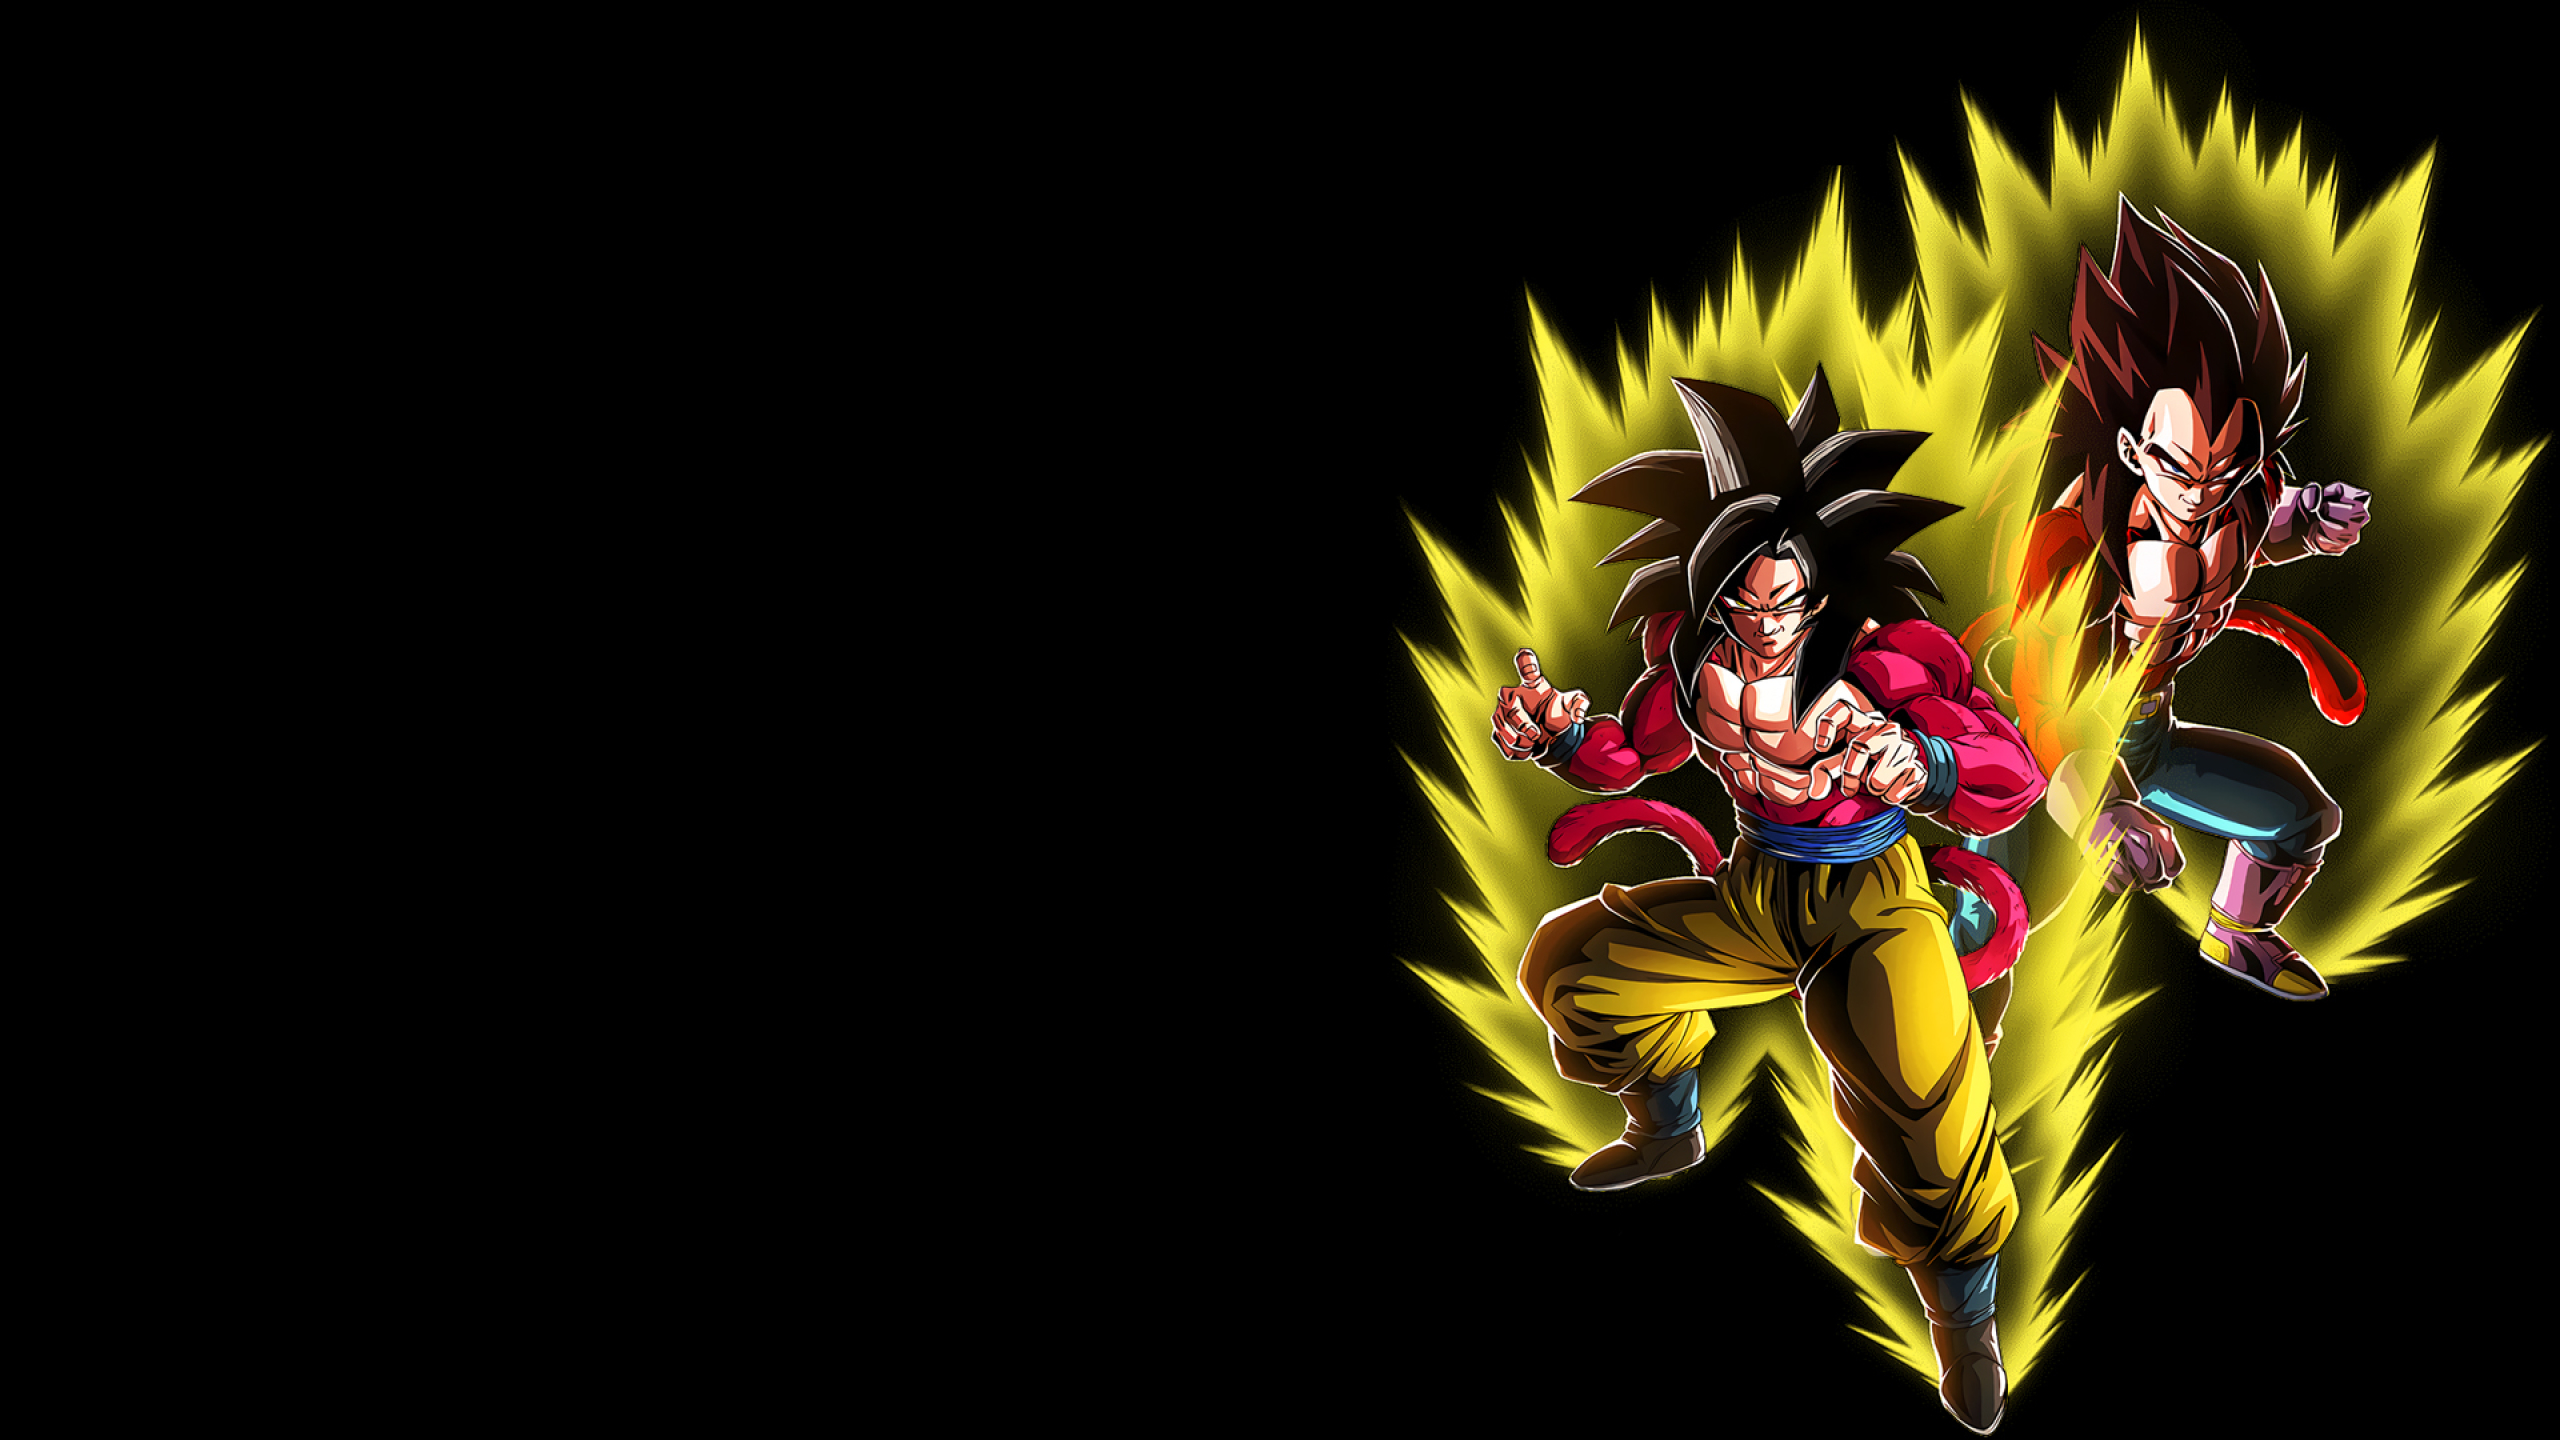 2560x1440 Goku Vegeta Ssj4 1440p Resolution Wallpaper Hd